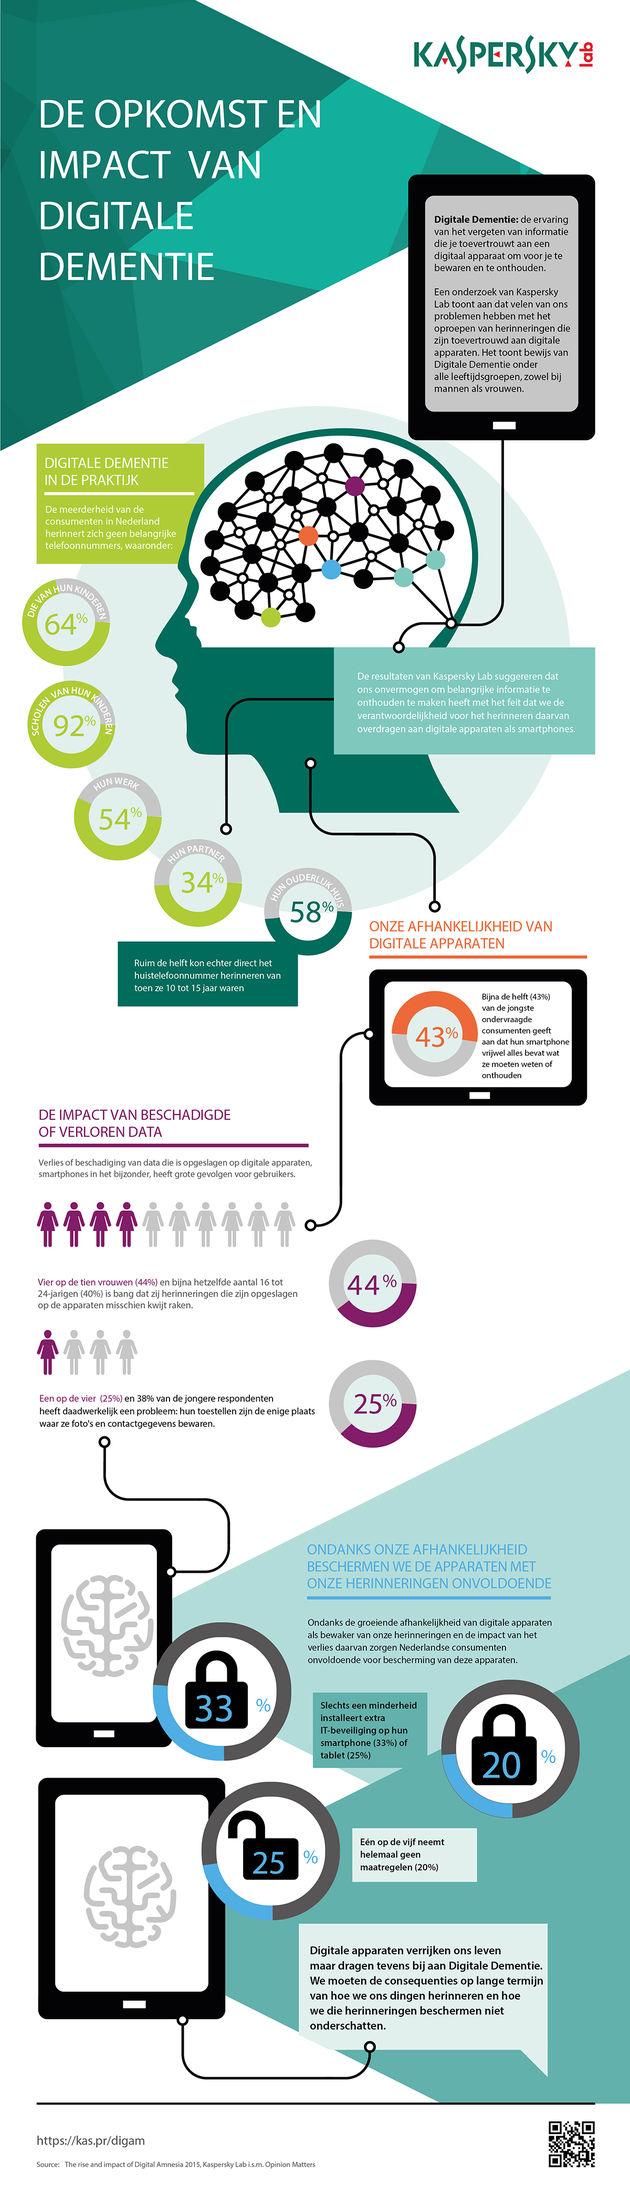 Kaspersky-Digital-Amnesia-Infographic